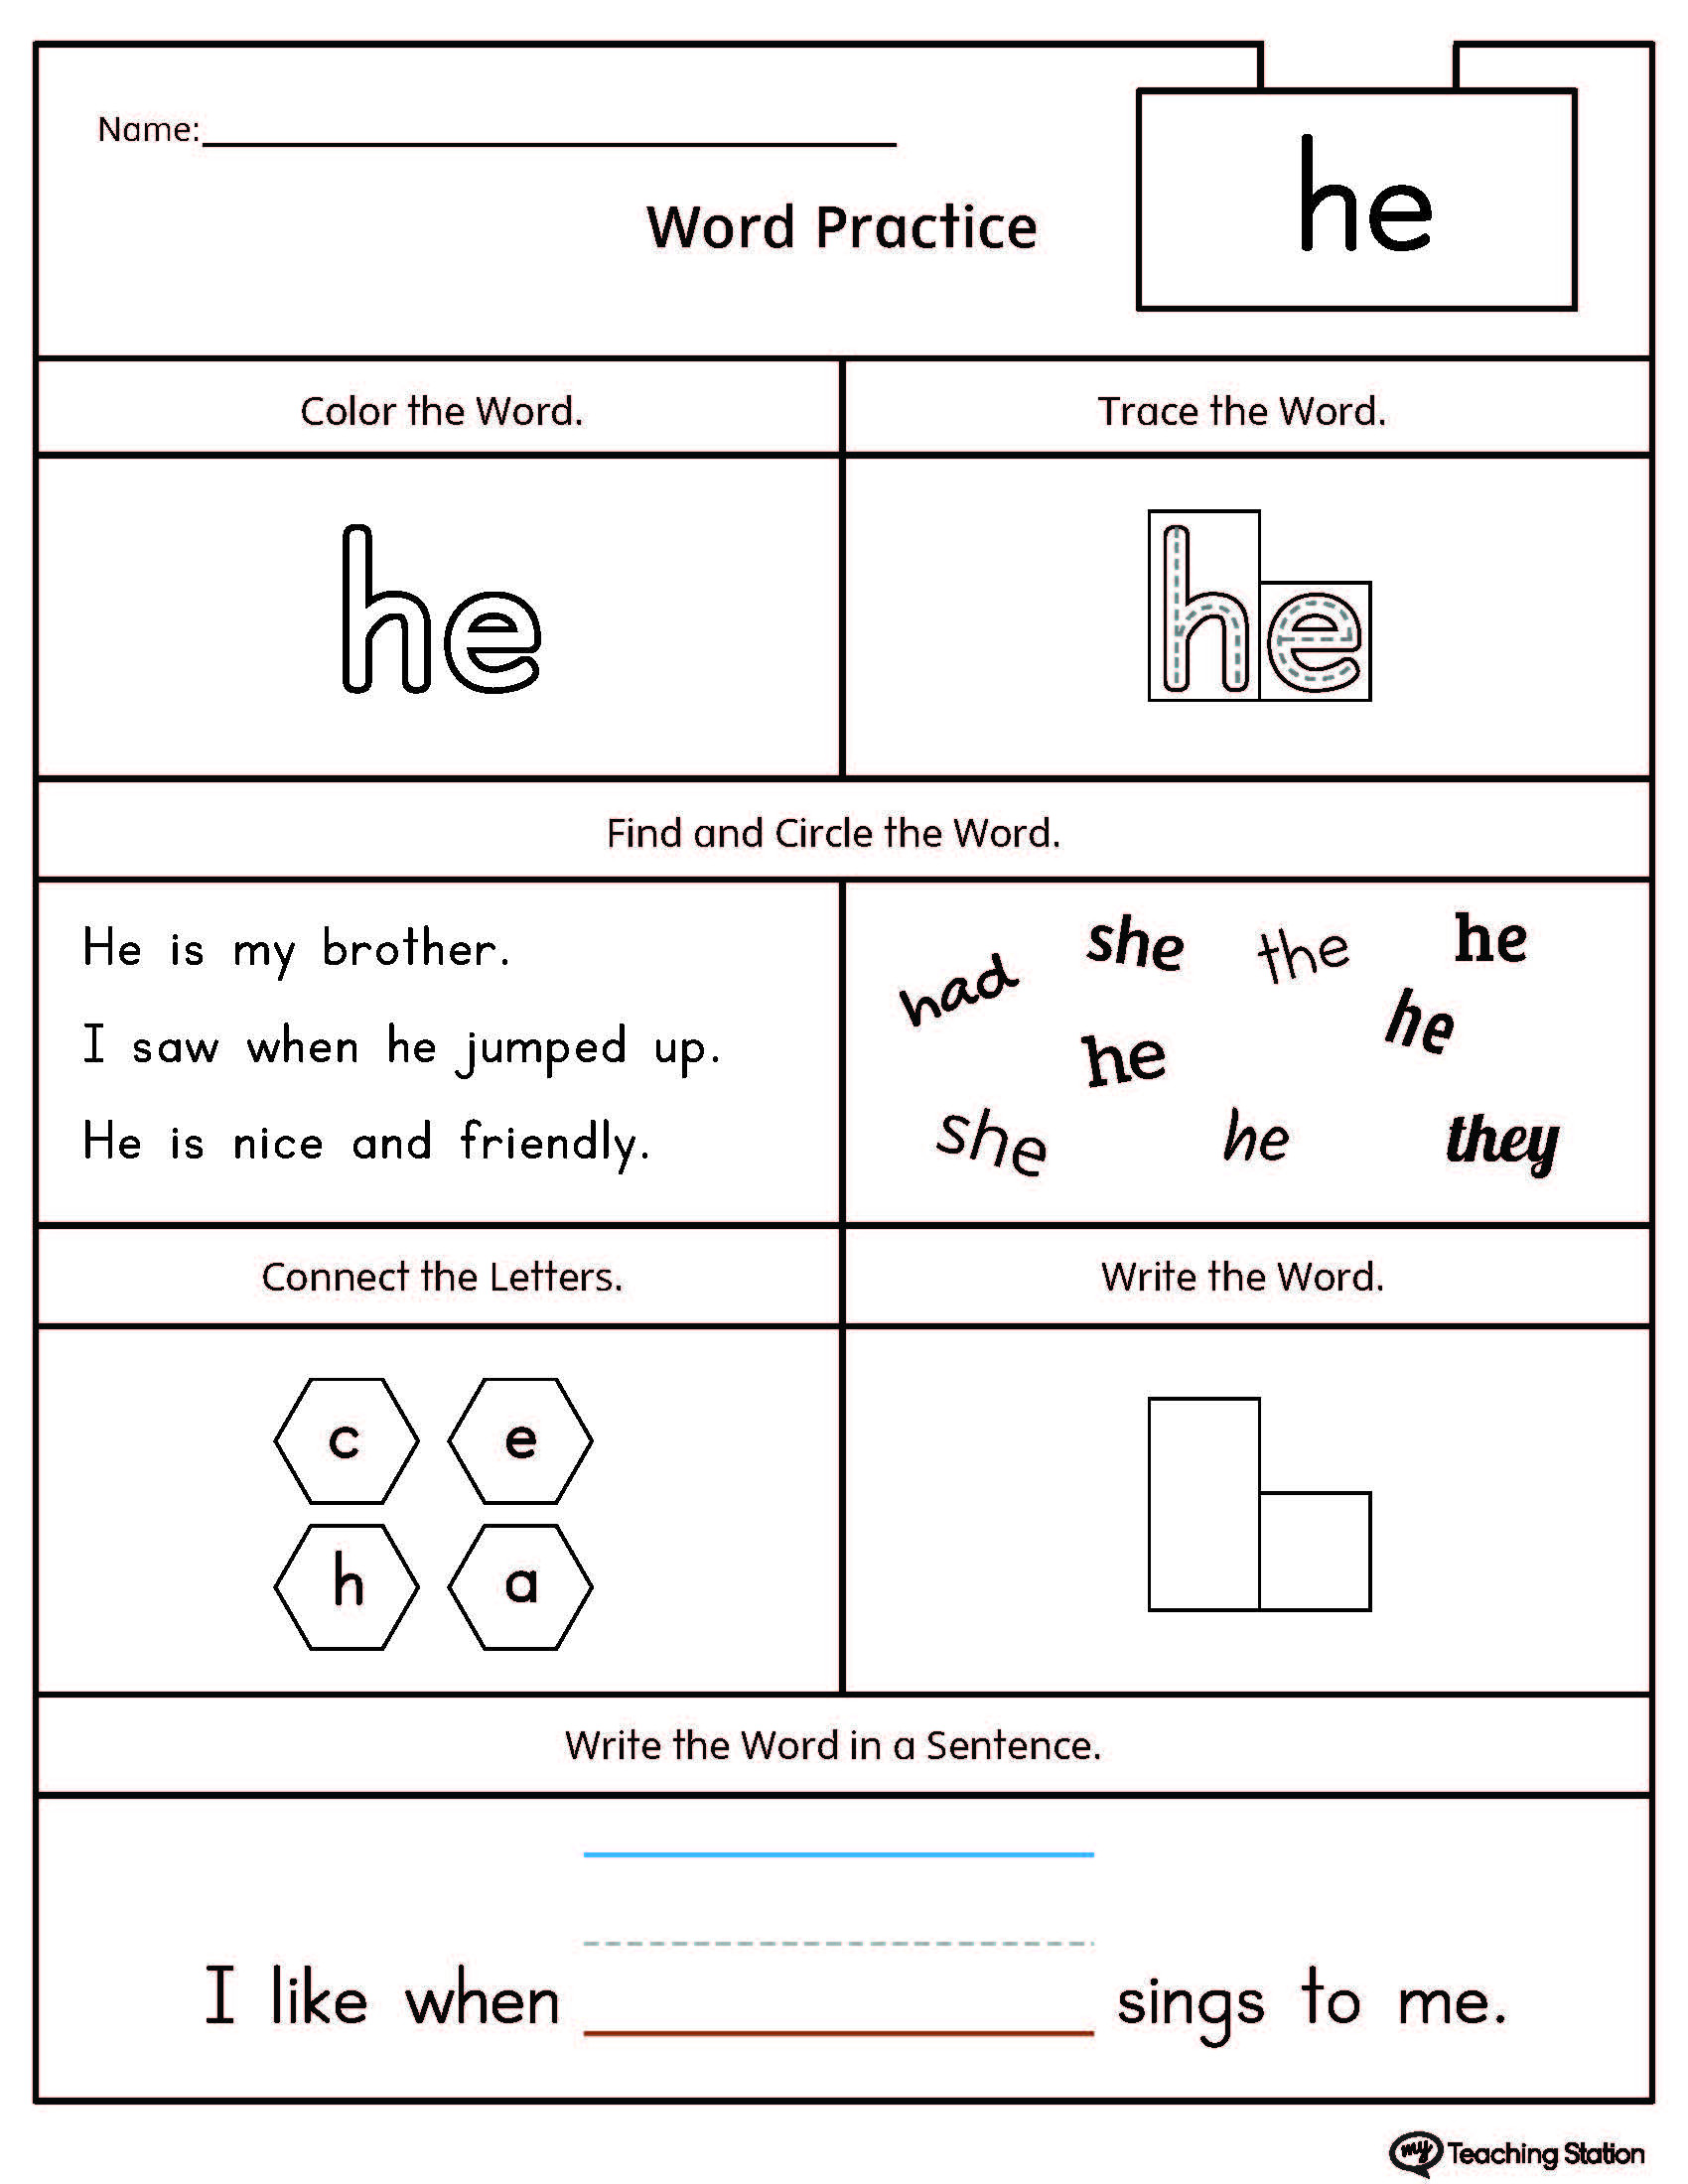 Kindergarten Sight Words Worksheet Free Kindergarten High Frequency Words Printable Worksheets